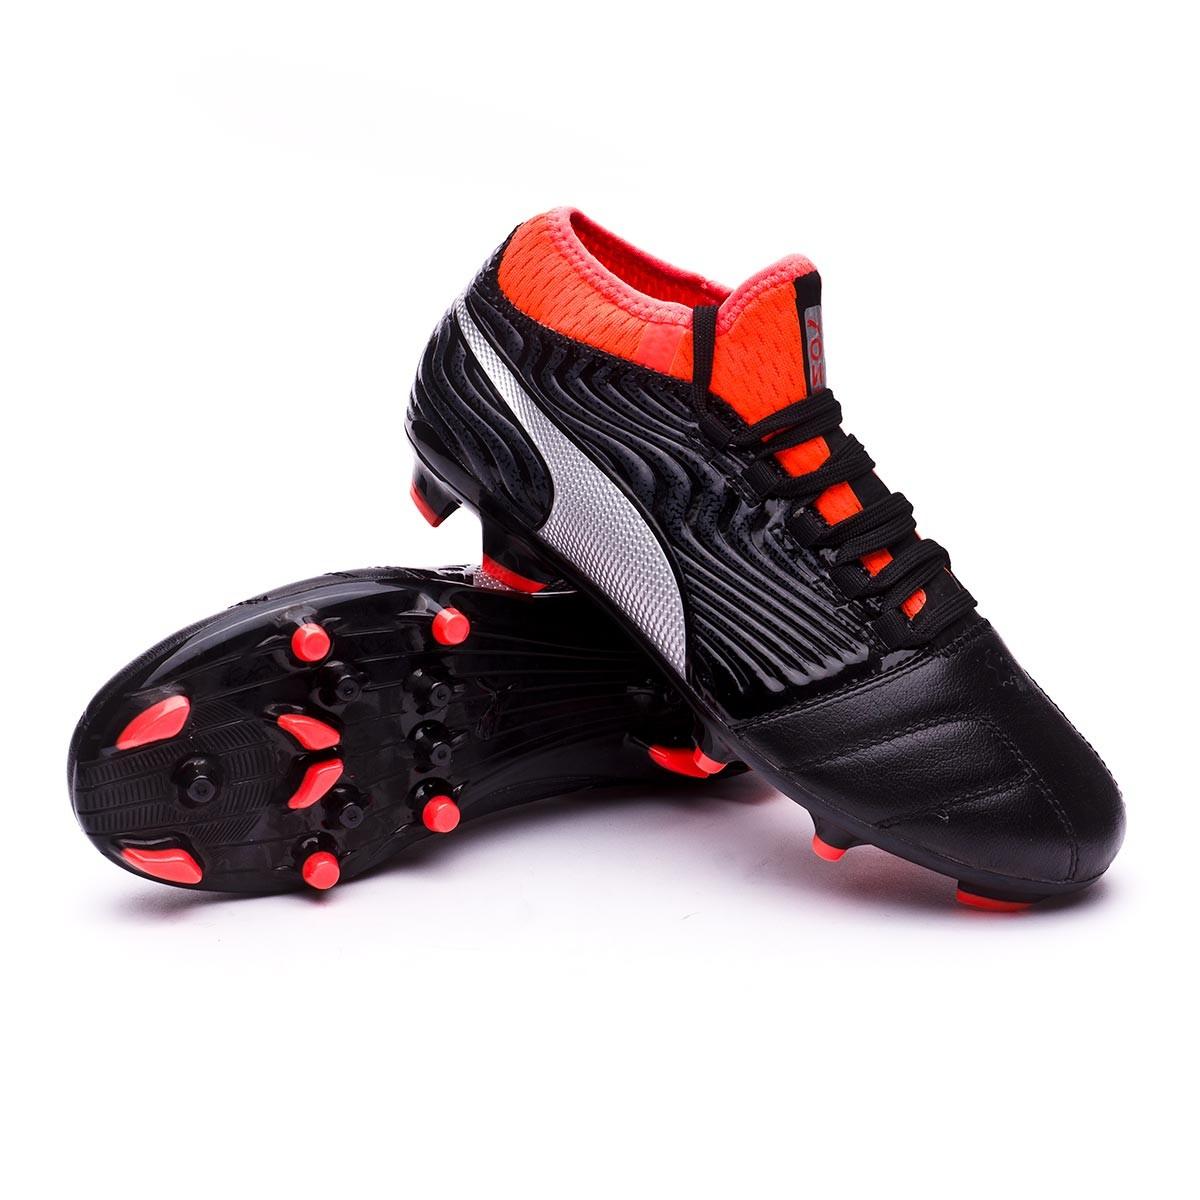 ... Bota One 18.3 AG Niño Puma Black-Puma Silver-Red Blast. Categorías de  la Bota de fútbol. Botas de fútbol 865c0a3284921